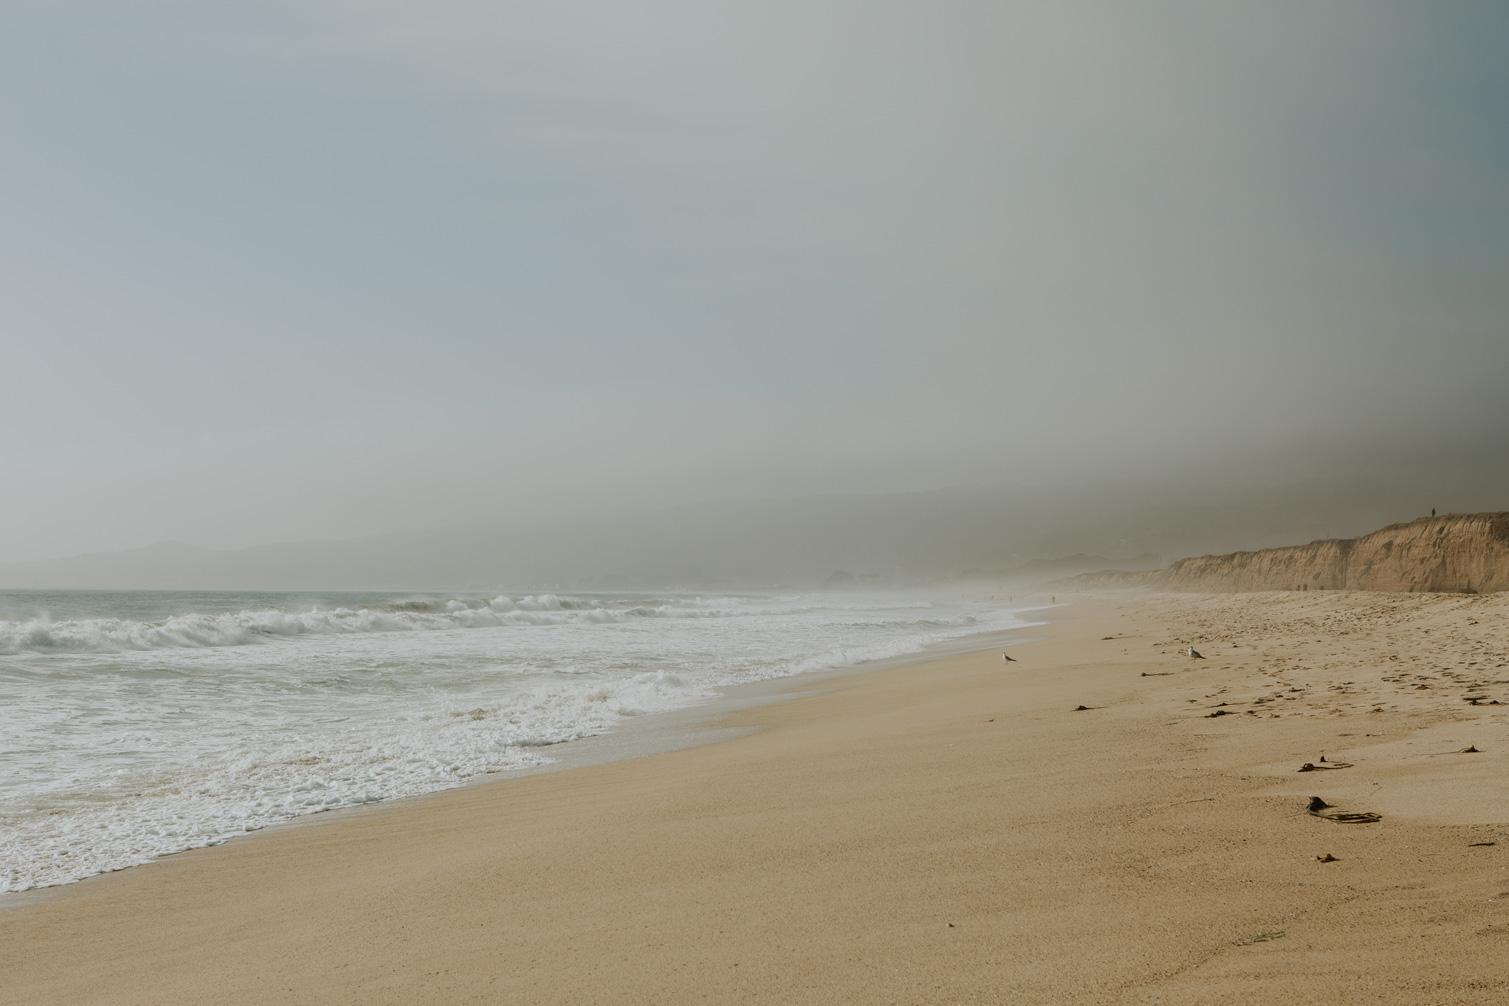 CindyGiovagnoli_SantCruz_SanJose_SanFrancisco_NelderGrove_sea_lions_boardwalk_hapas_brewery_sourdough_ocean_half_moon_bay_California-052.jpg